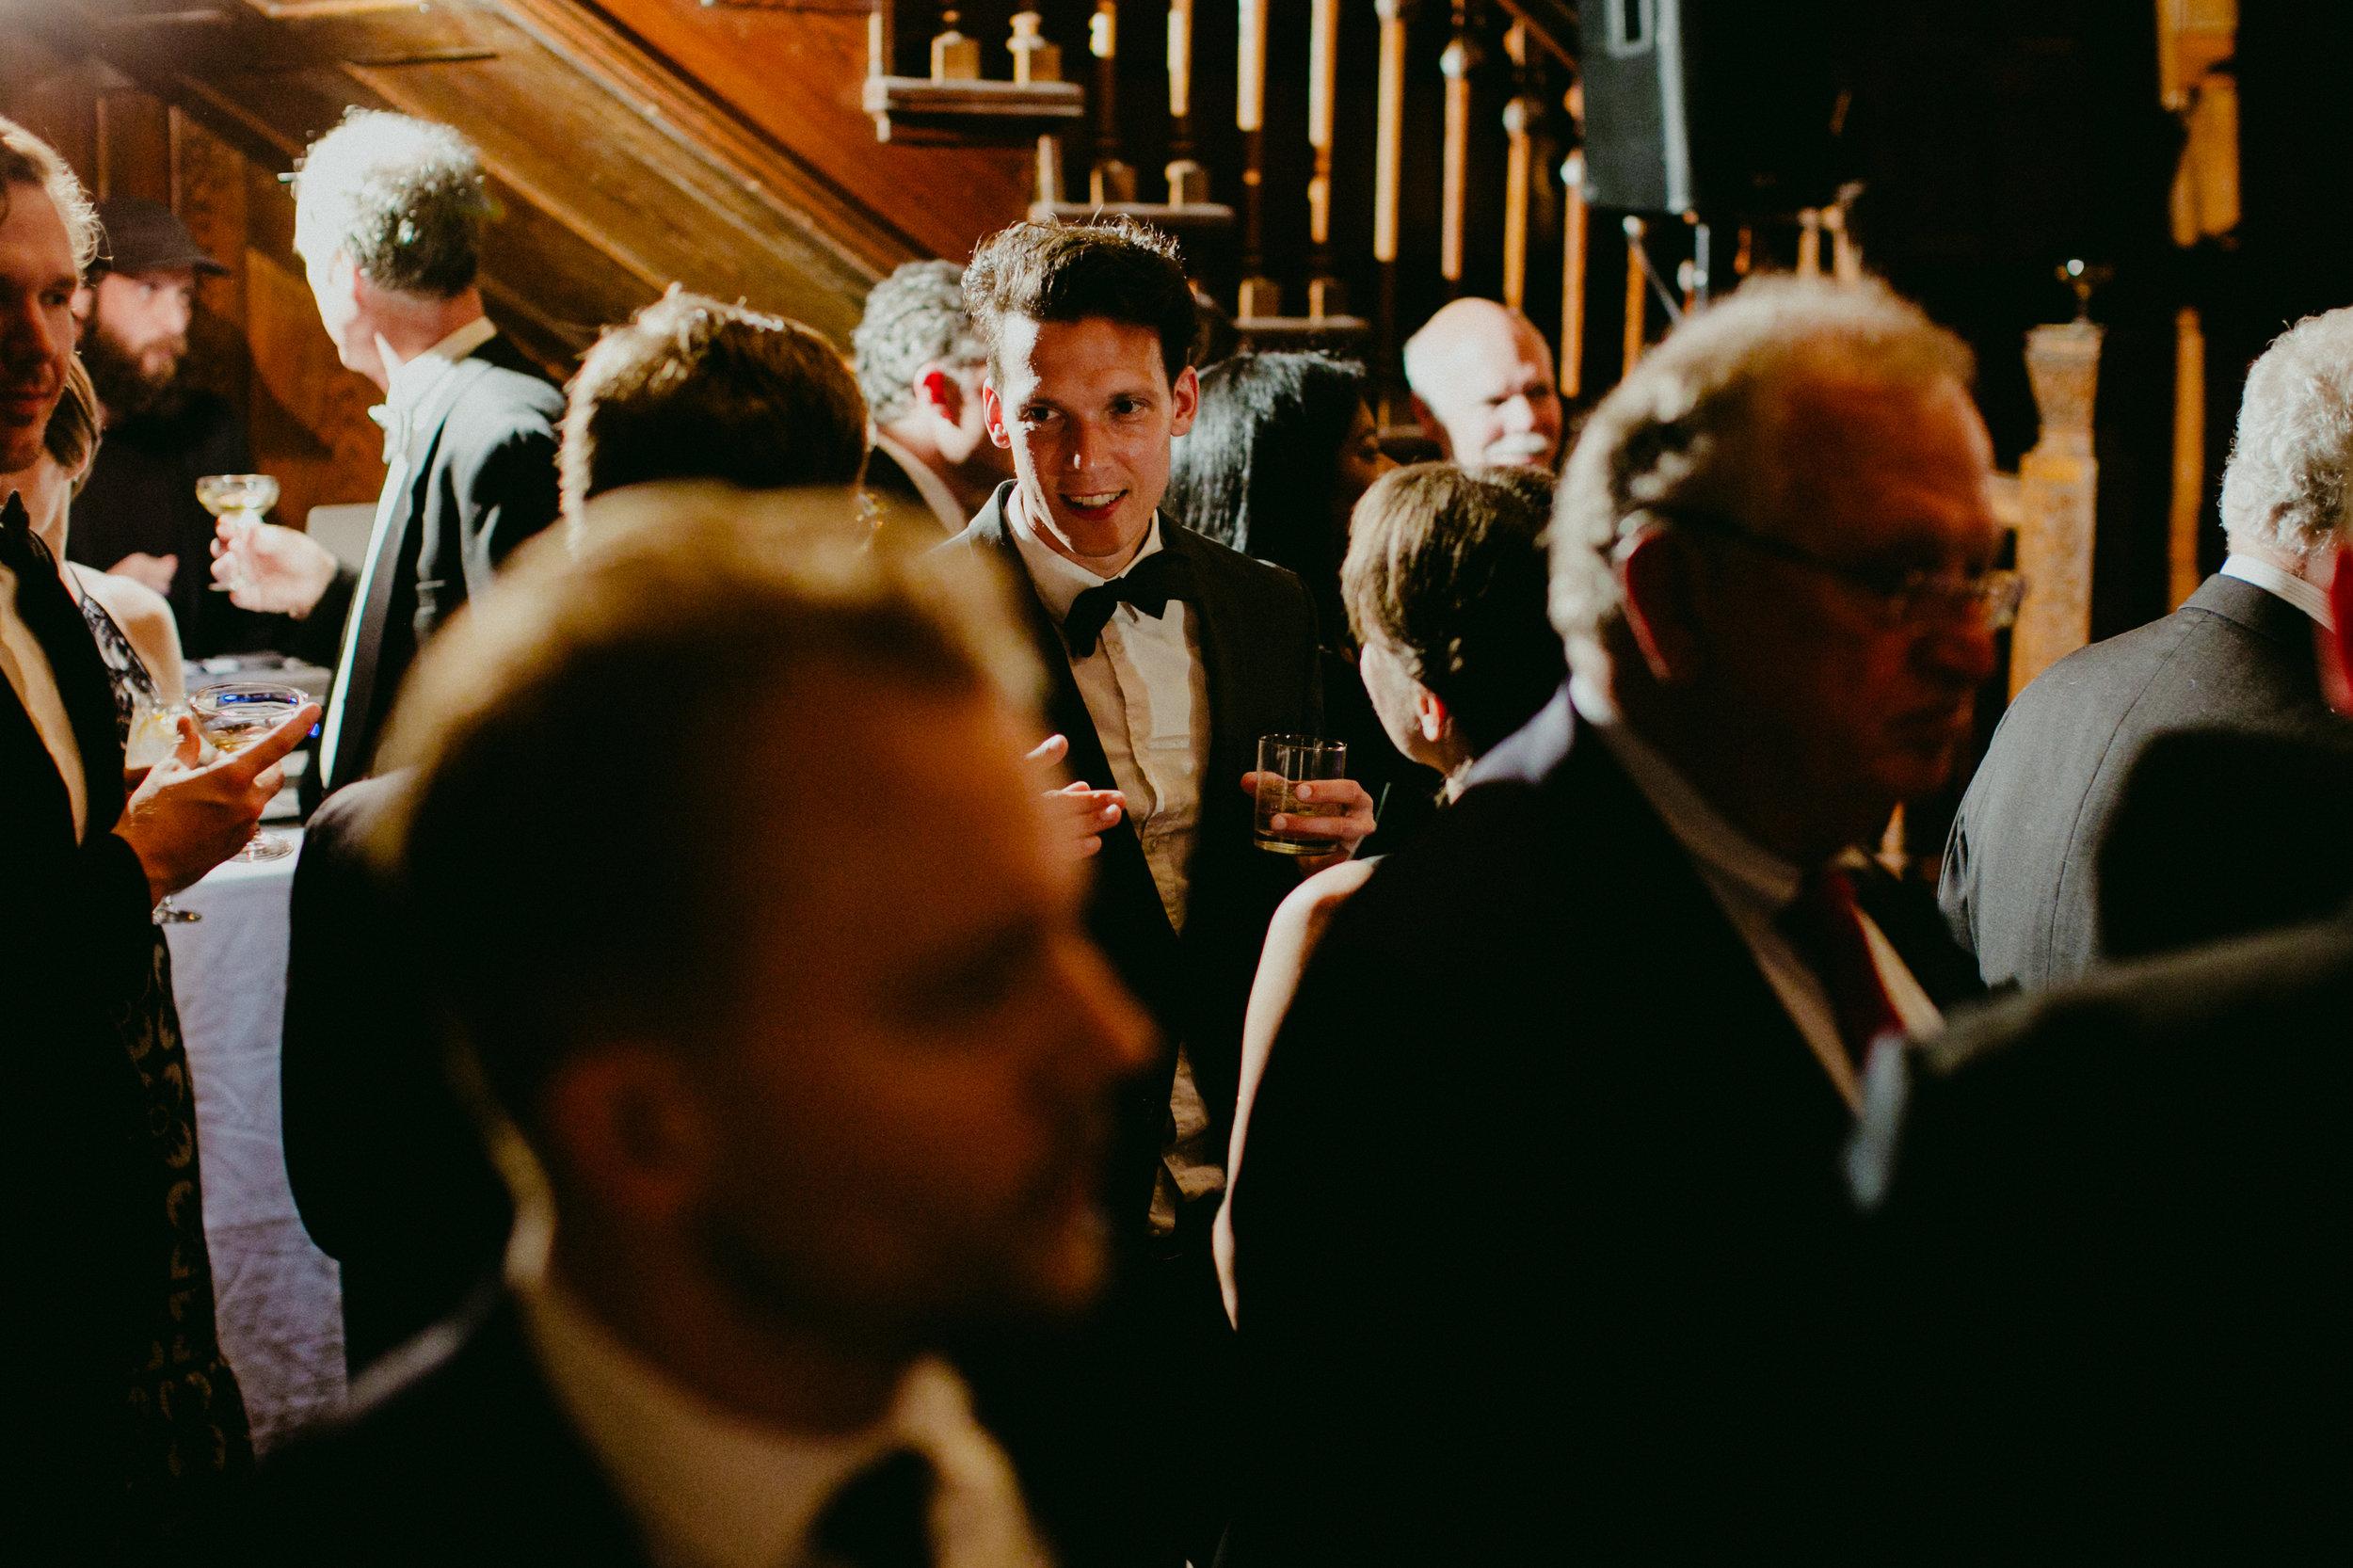 Tiger_House_The_Inn_at_Hudson-Wedding_Chellise_Michael_Photography-366.jpg